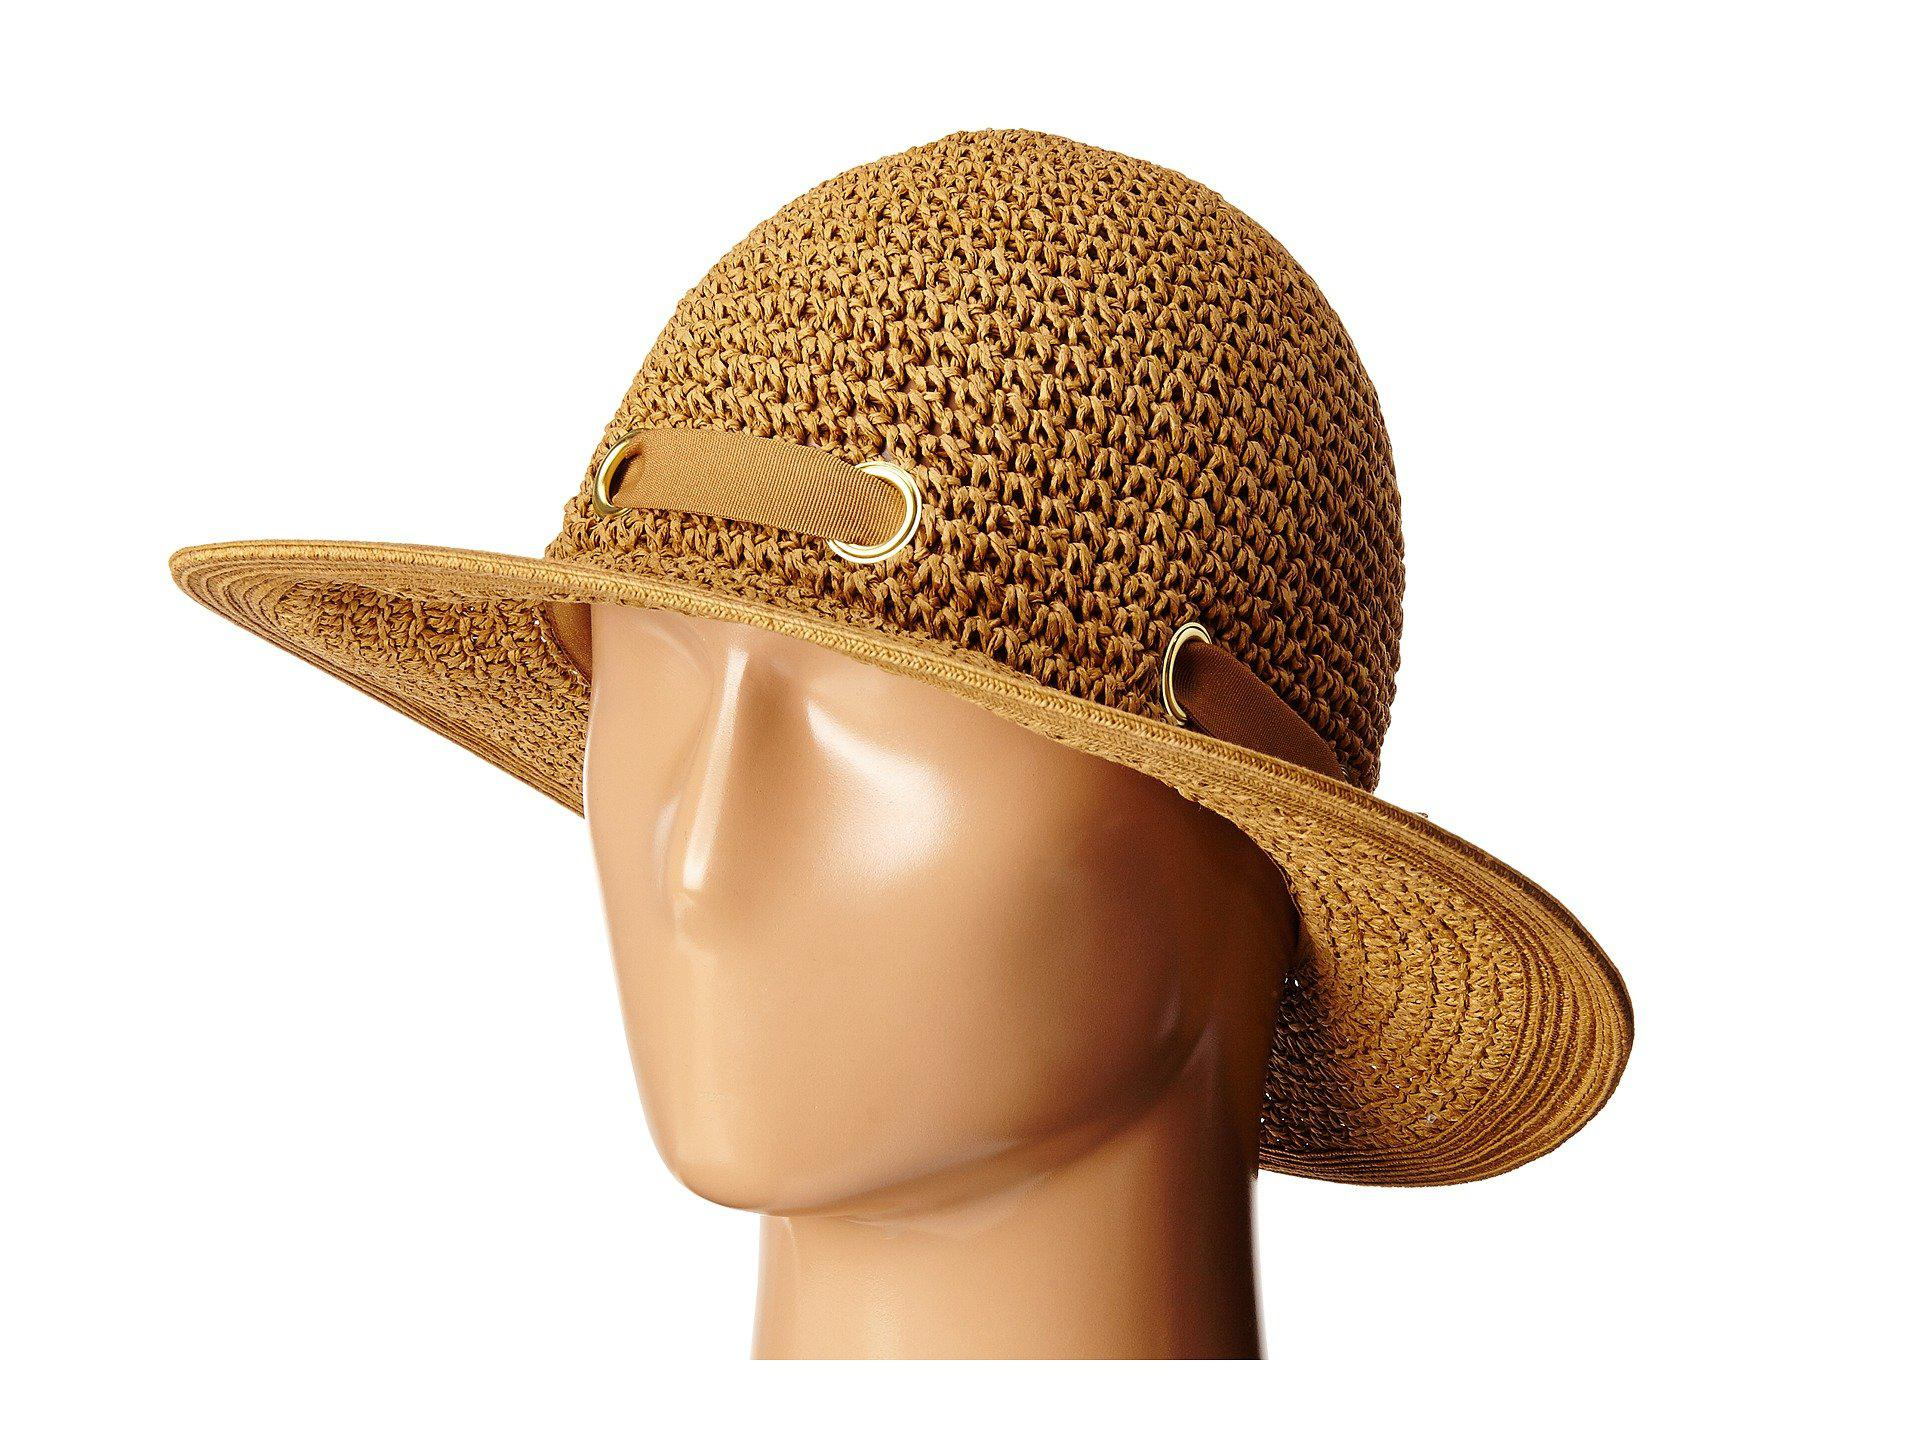 Lyst - San Diego Hat Company Pbm1029 Crochet Floppy Hat With ... 39d8b5f505c5